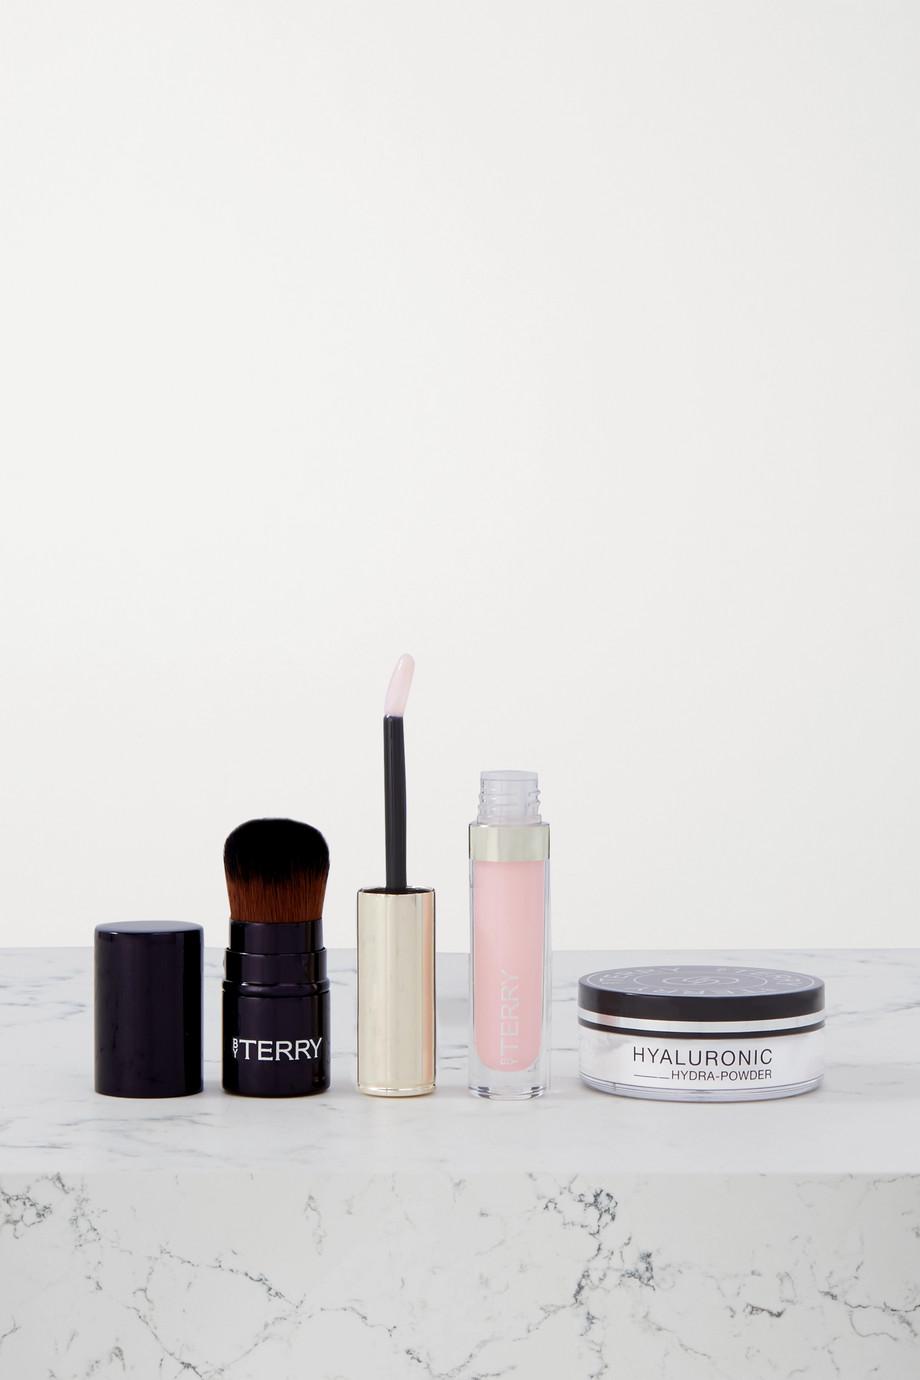 BY TERRY Twinkle Glow Mini to Go Set – Set aus Lippenpflege, Puder und Pinsel